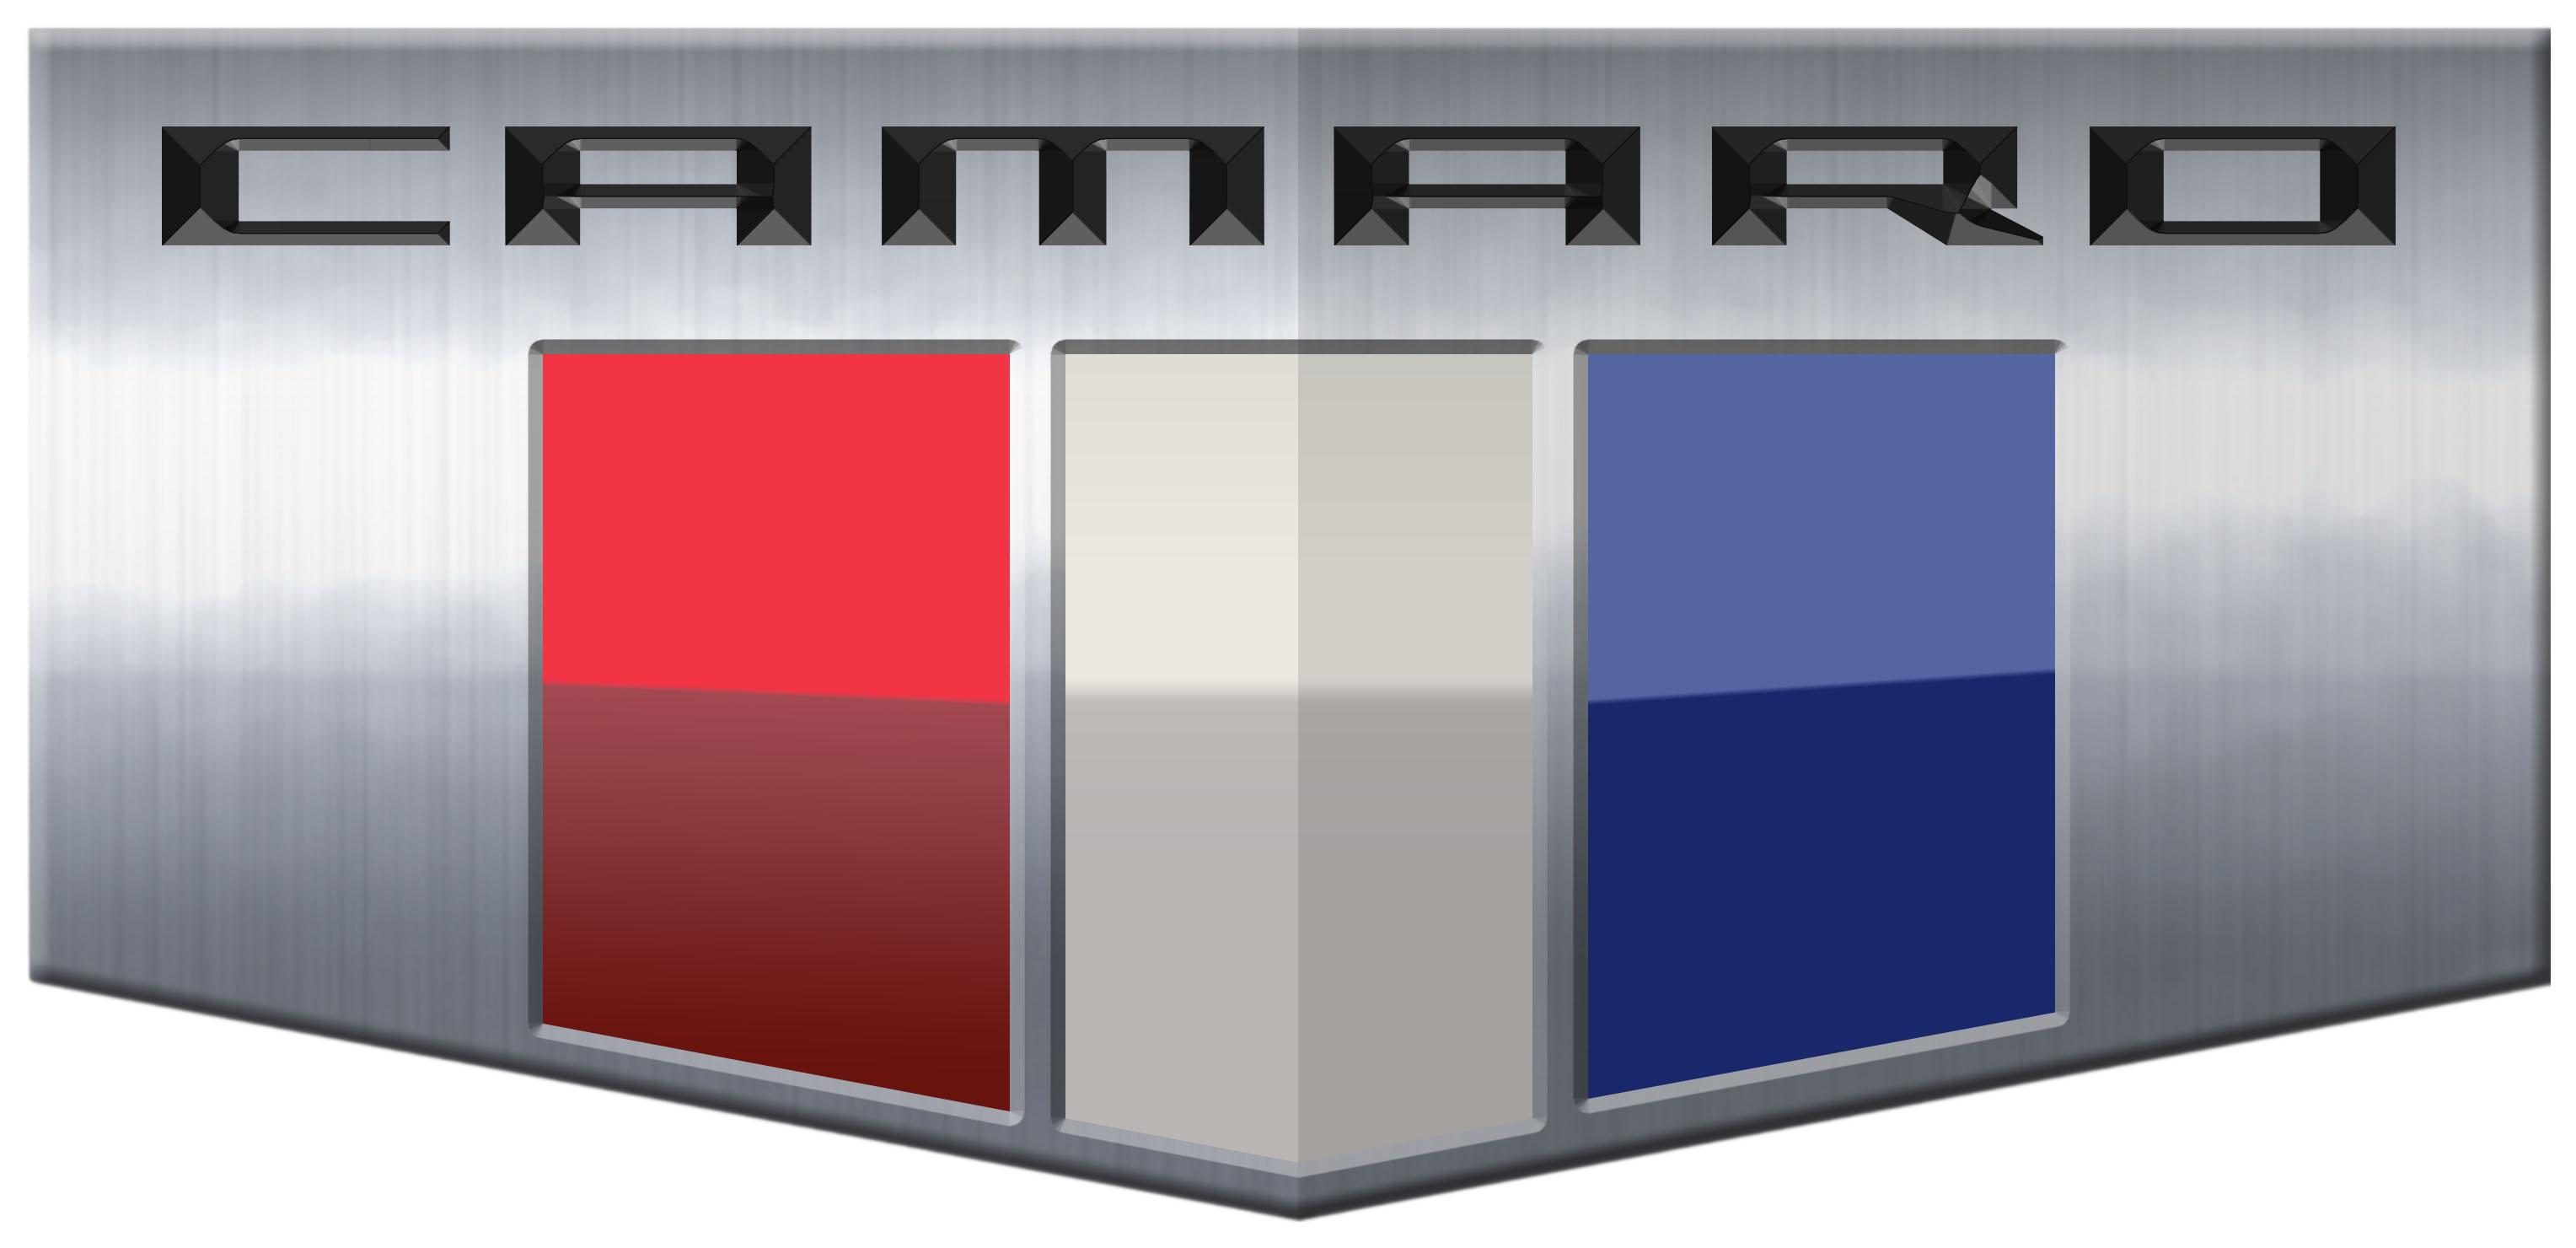 Logo Chevrolet Camaro Ide Dimage De Voiture 1968 Symbol Media Lietuva Nuotraukos